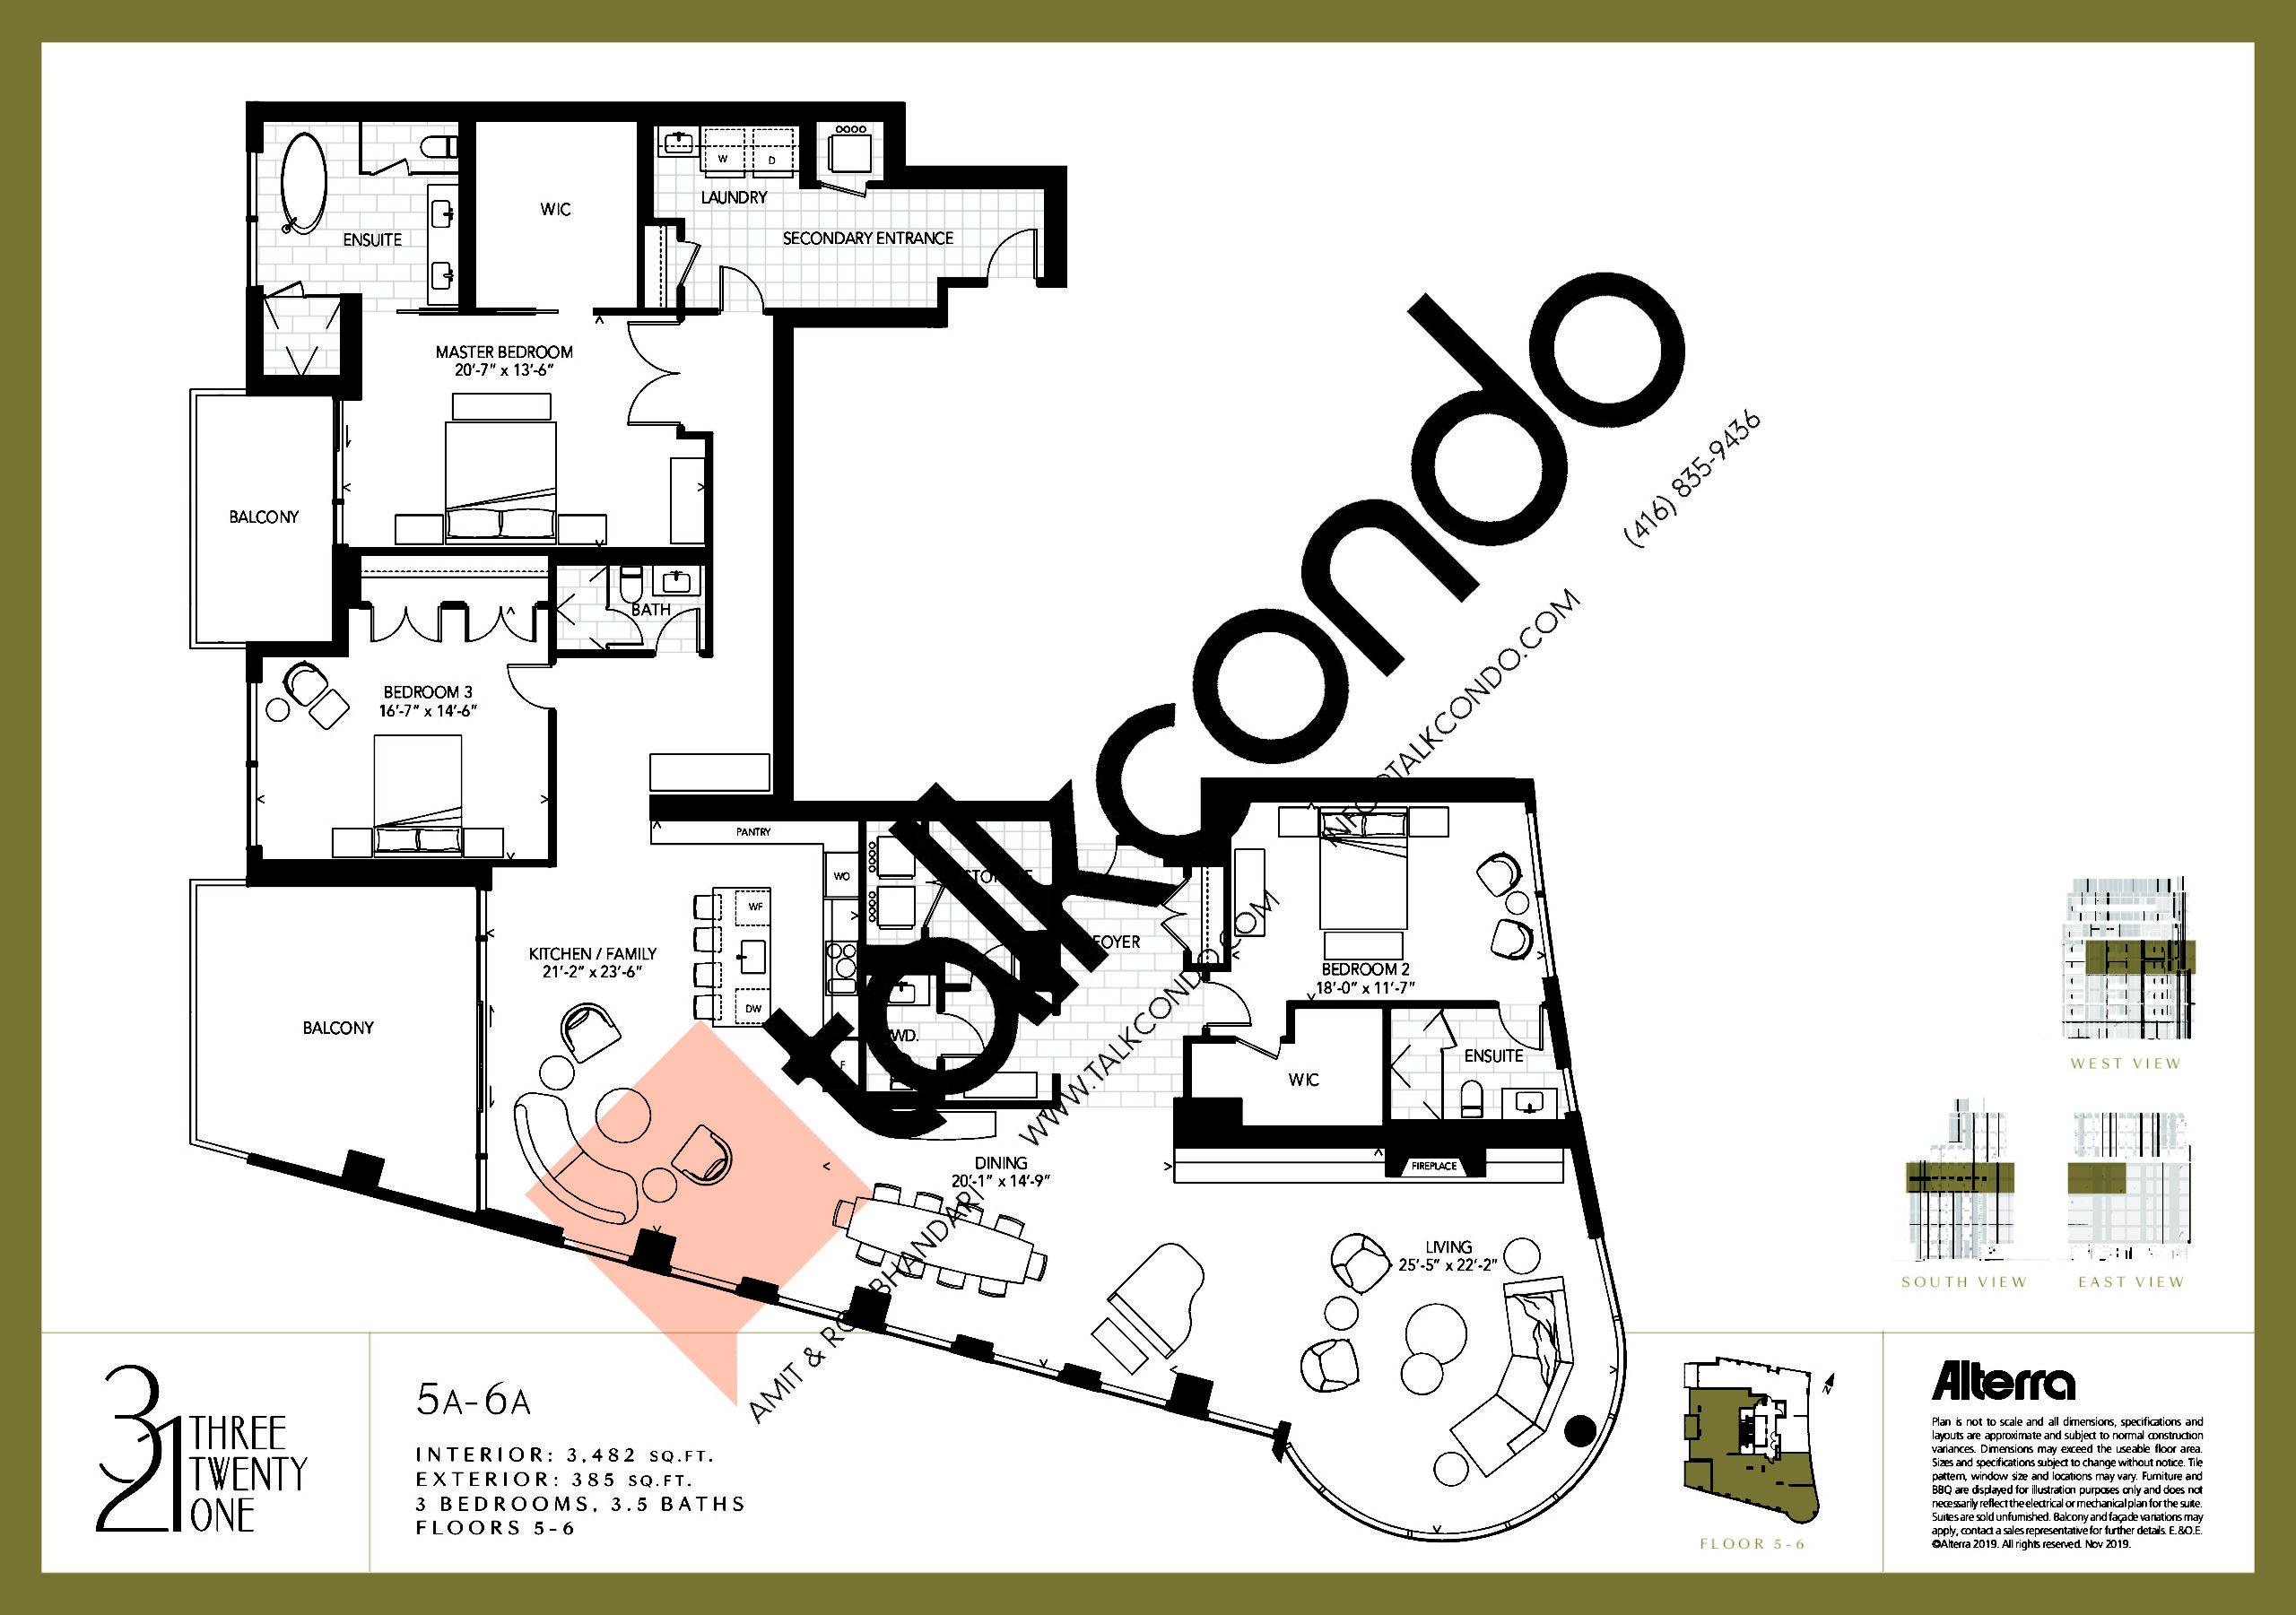 5A-6A Floor Plan at 321 Davenport Condos - 3482 sq.ft